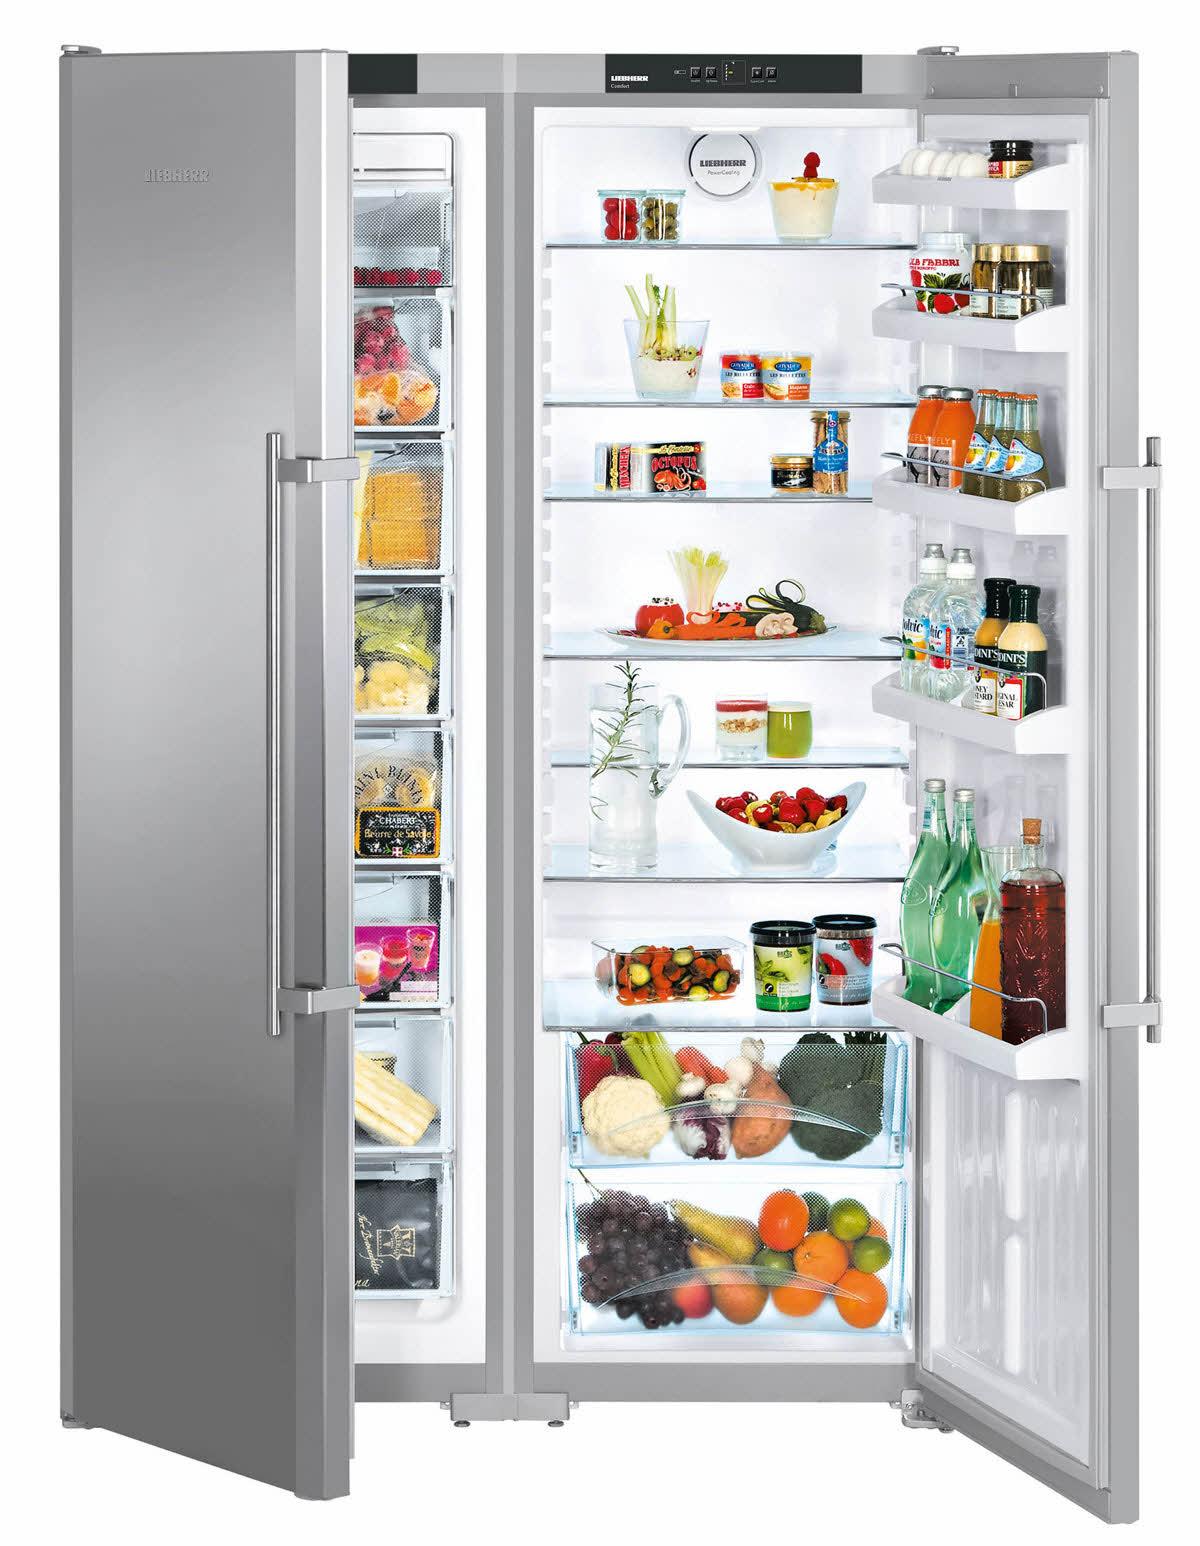 Side-by-side холодильник Liebherr SBSesf 7212 купить украина